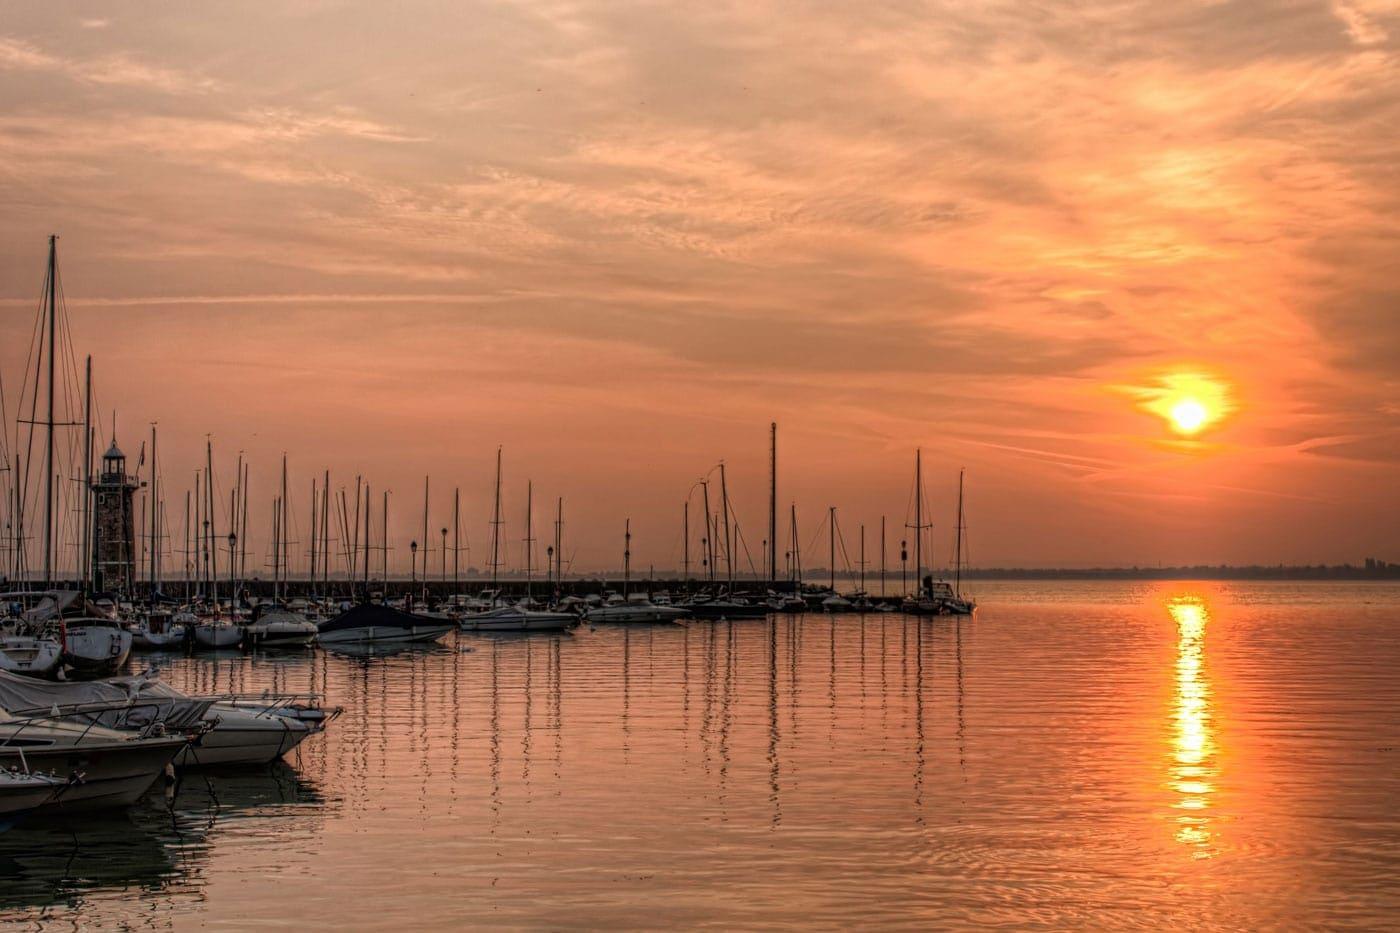 Port of Desenzano del Garda. HDR Photo of the sunrise at Lake Garda in Italy